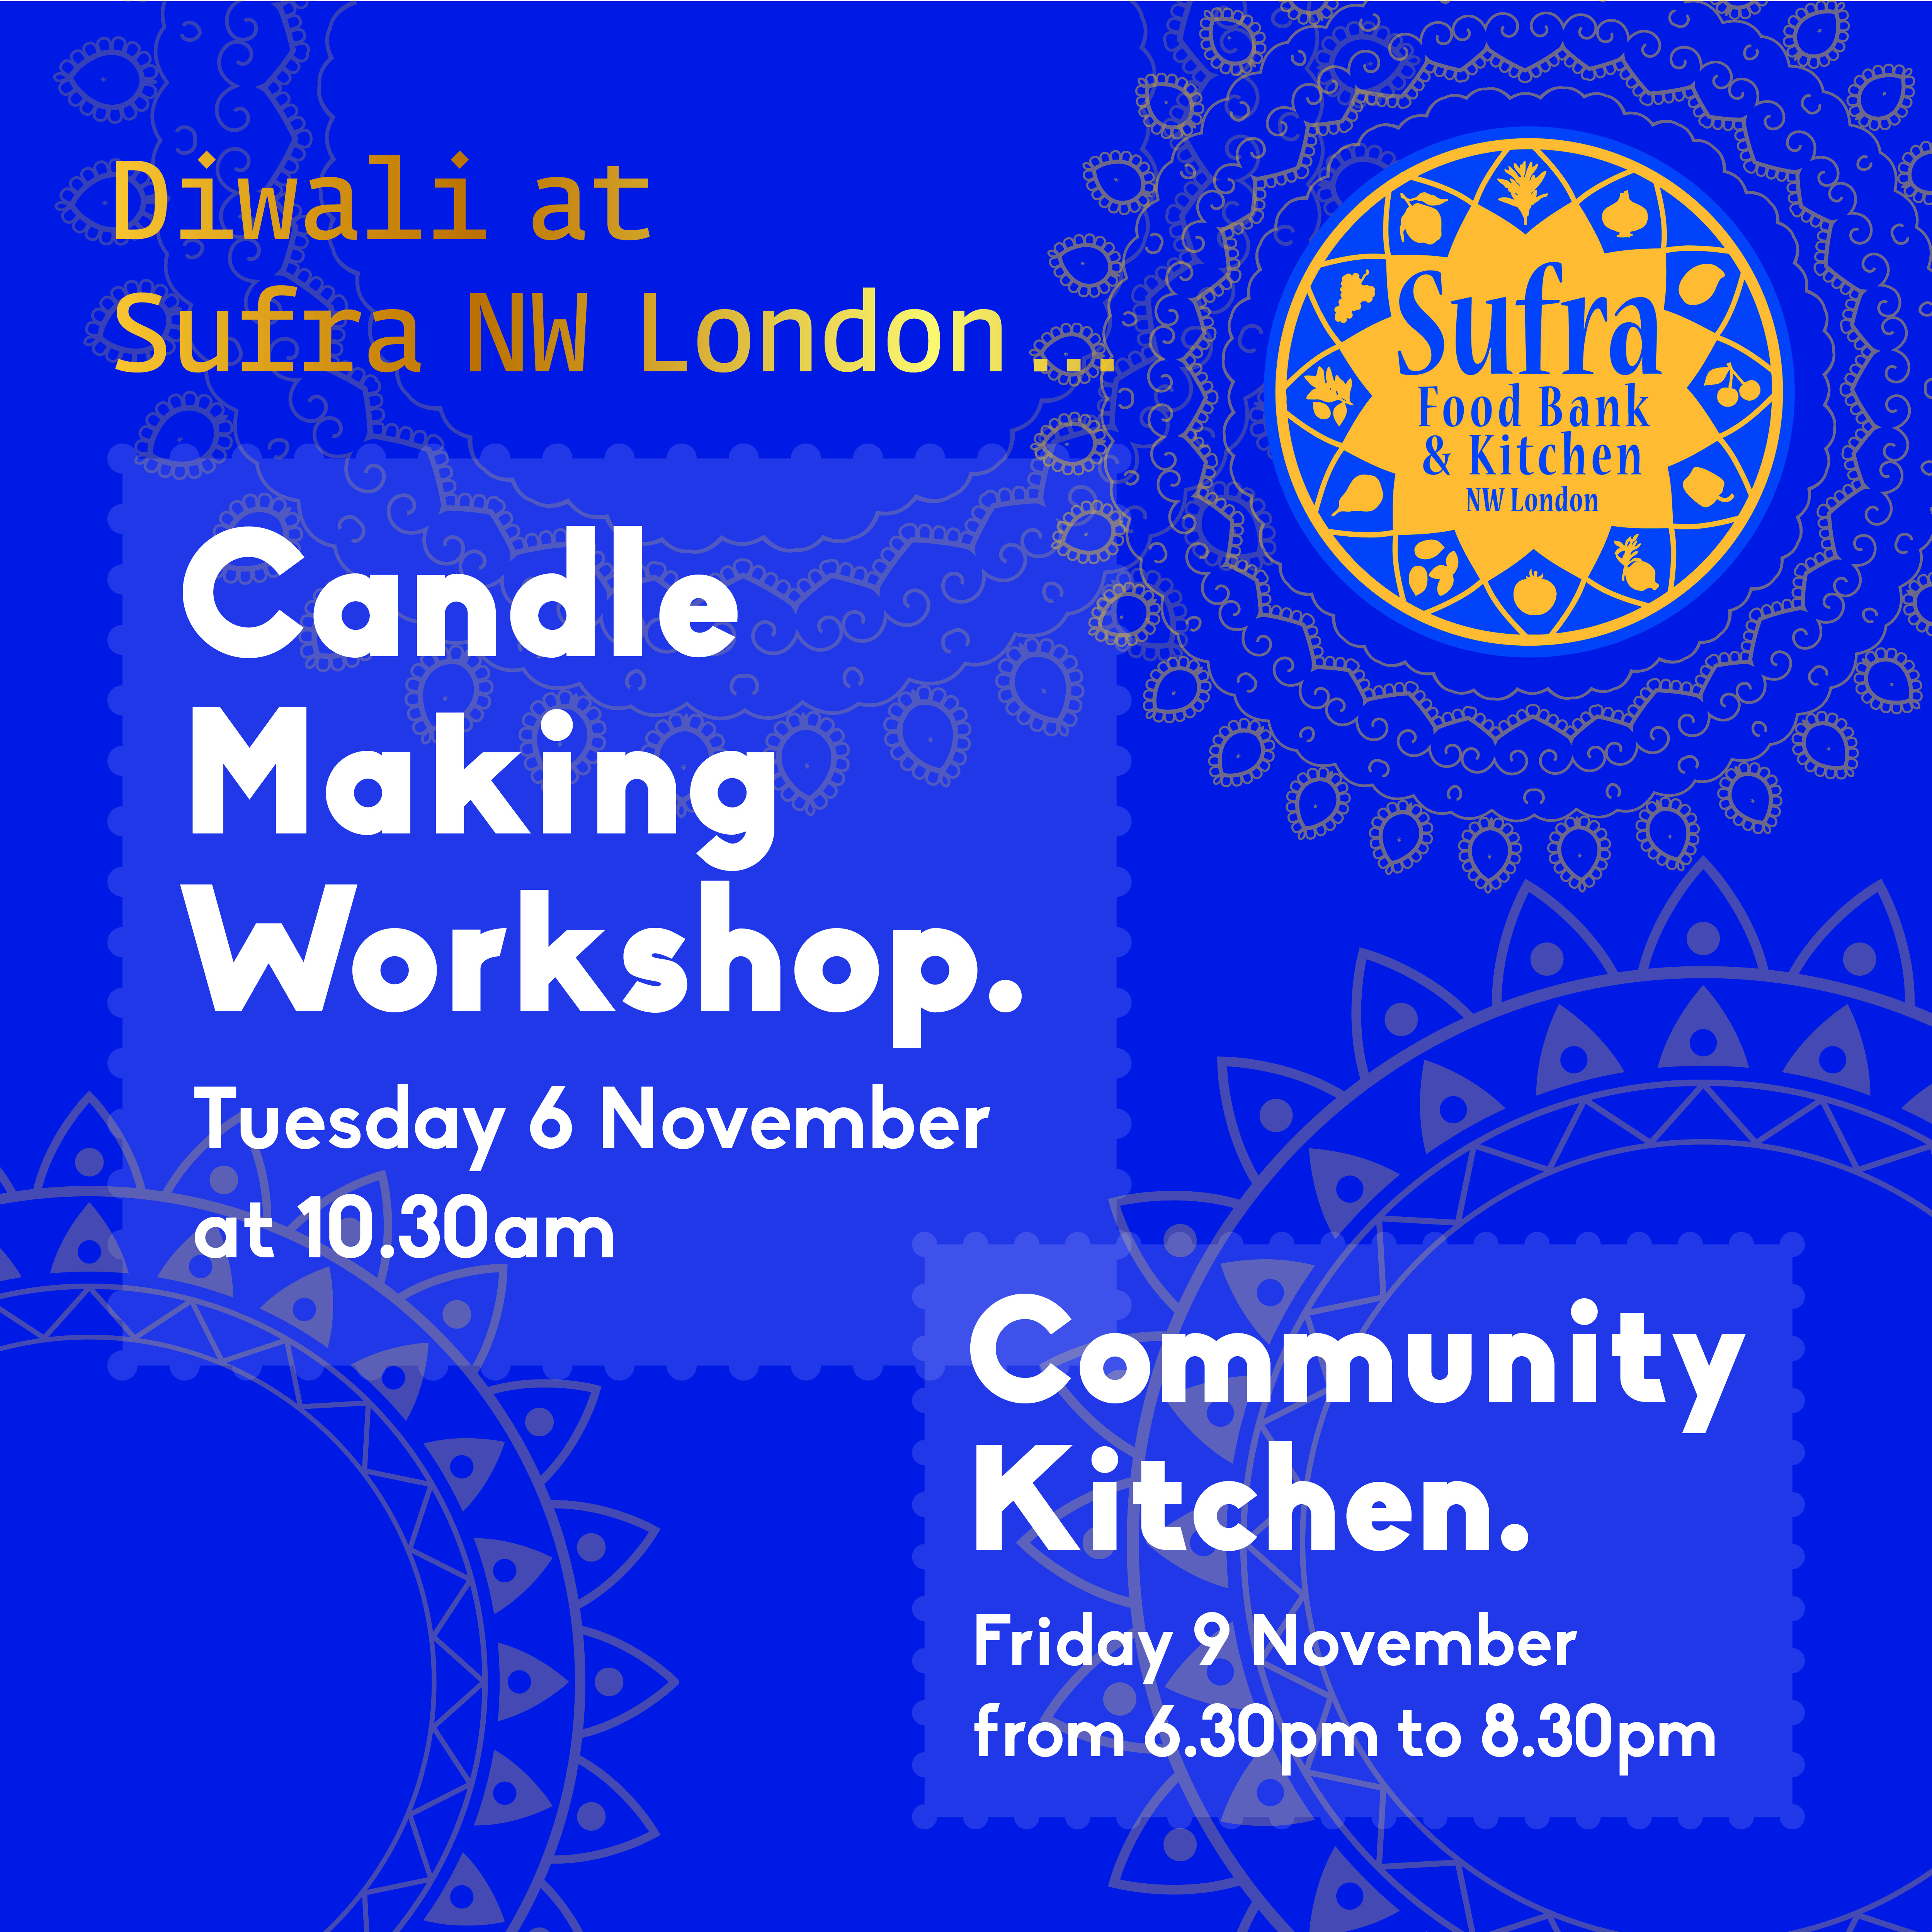 Diwali @ Sufra NW London